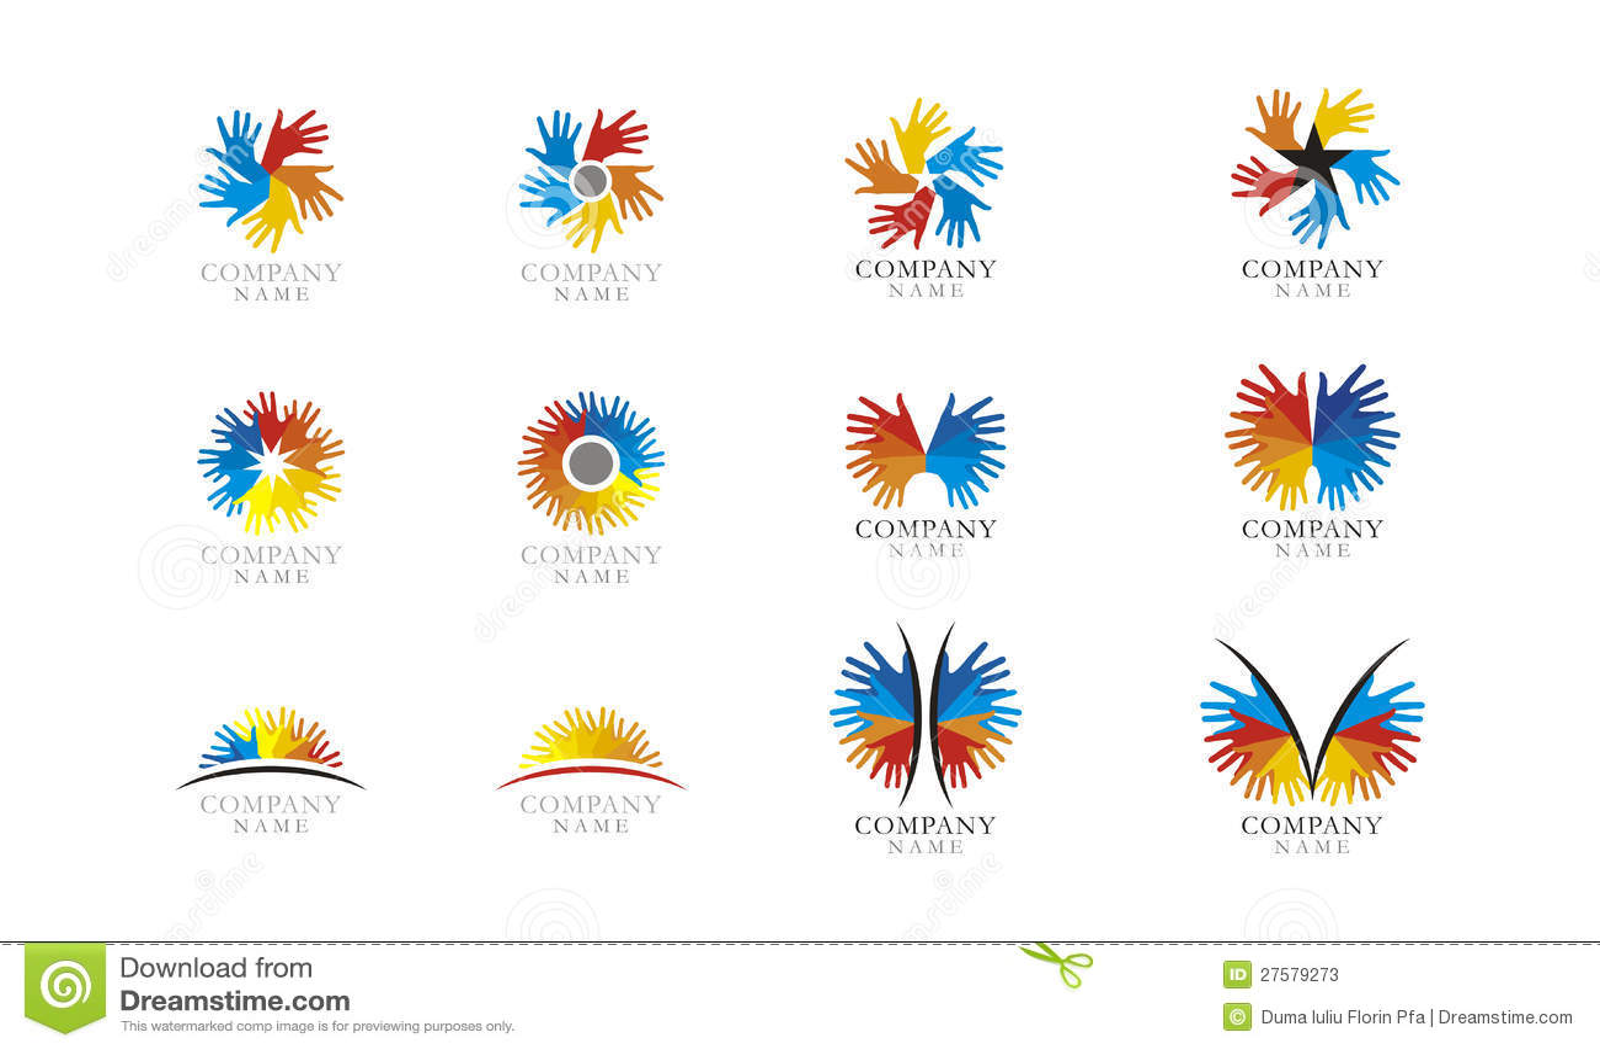 Graphisme réglé de logo